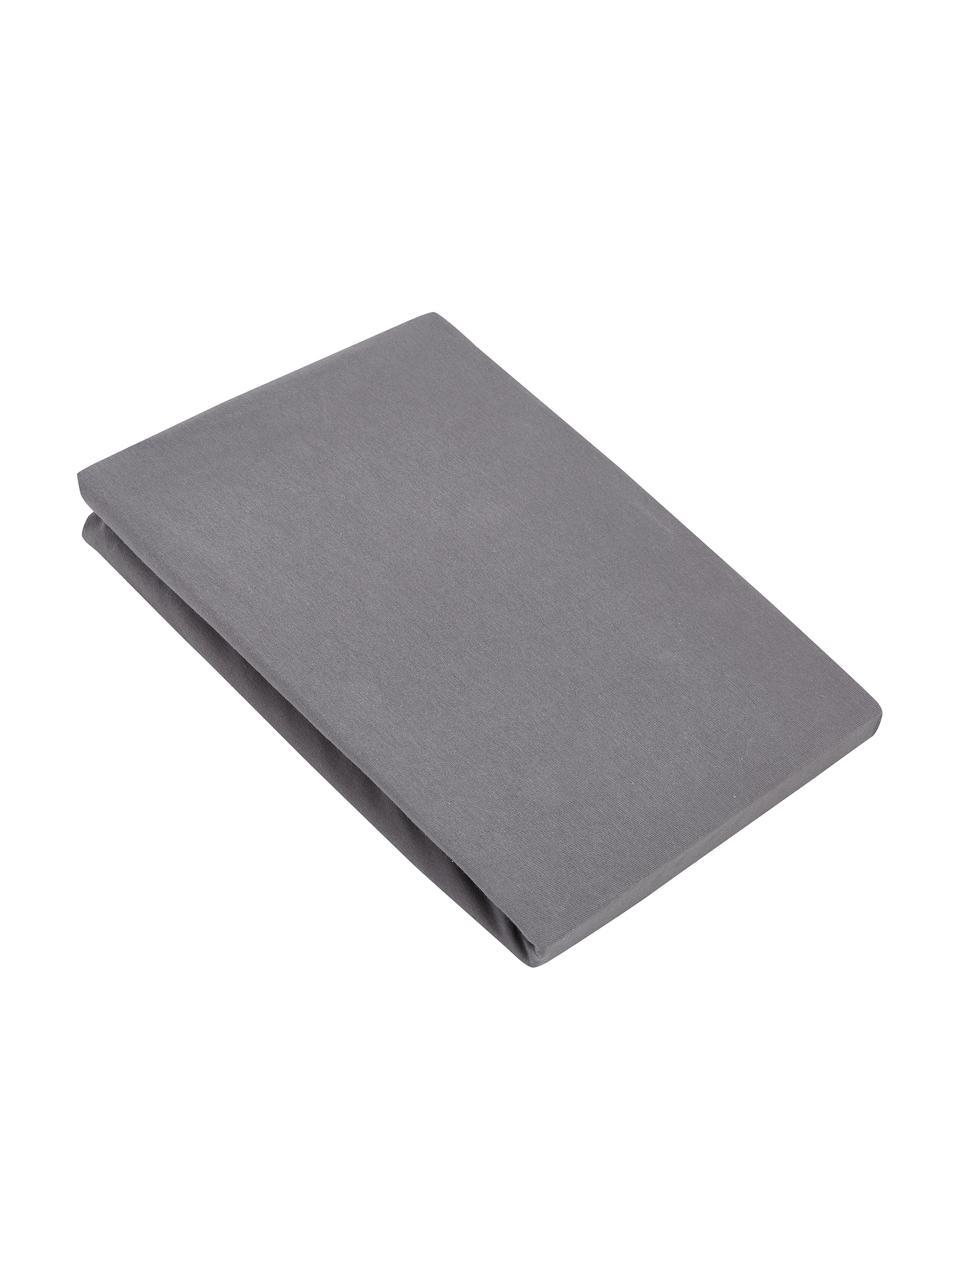 Lenzuolo con angoli in jersey-elastan grigio scuro Lara, 95% cotone, 5% elastan, Grigio scuro, Larg. 200 x Lung. 200 cm